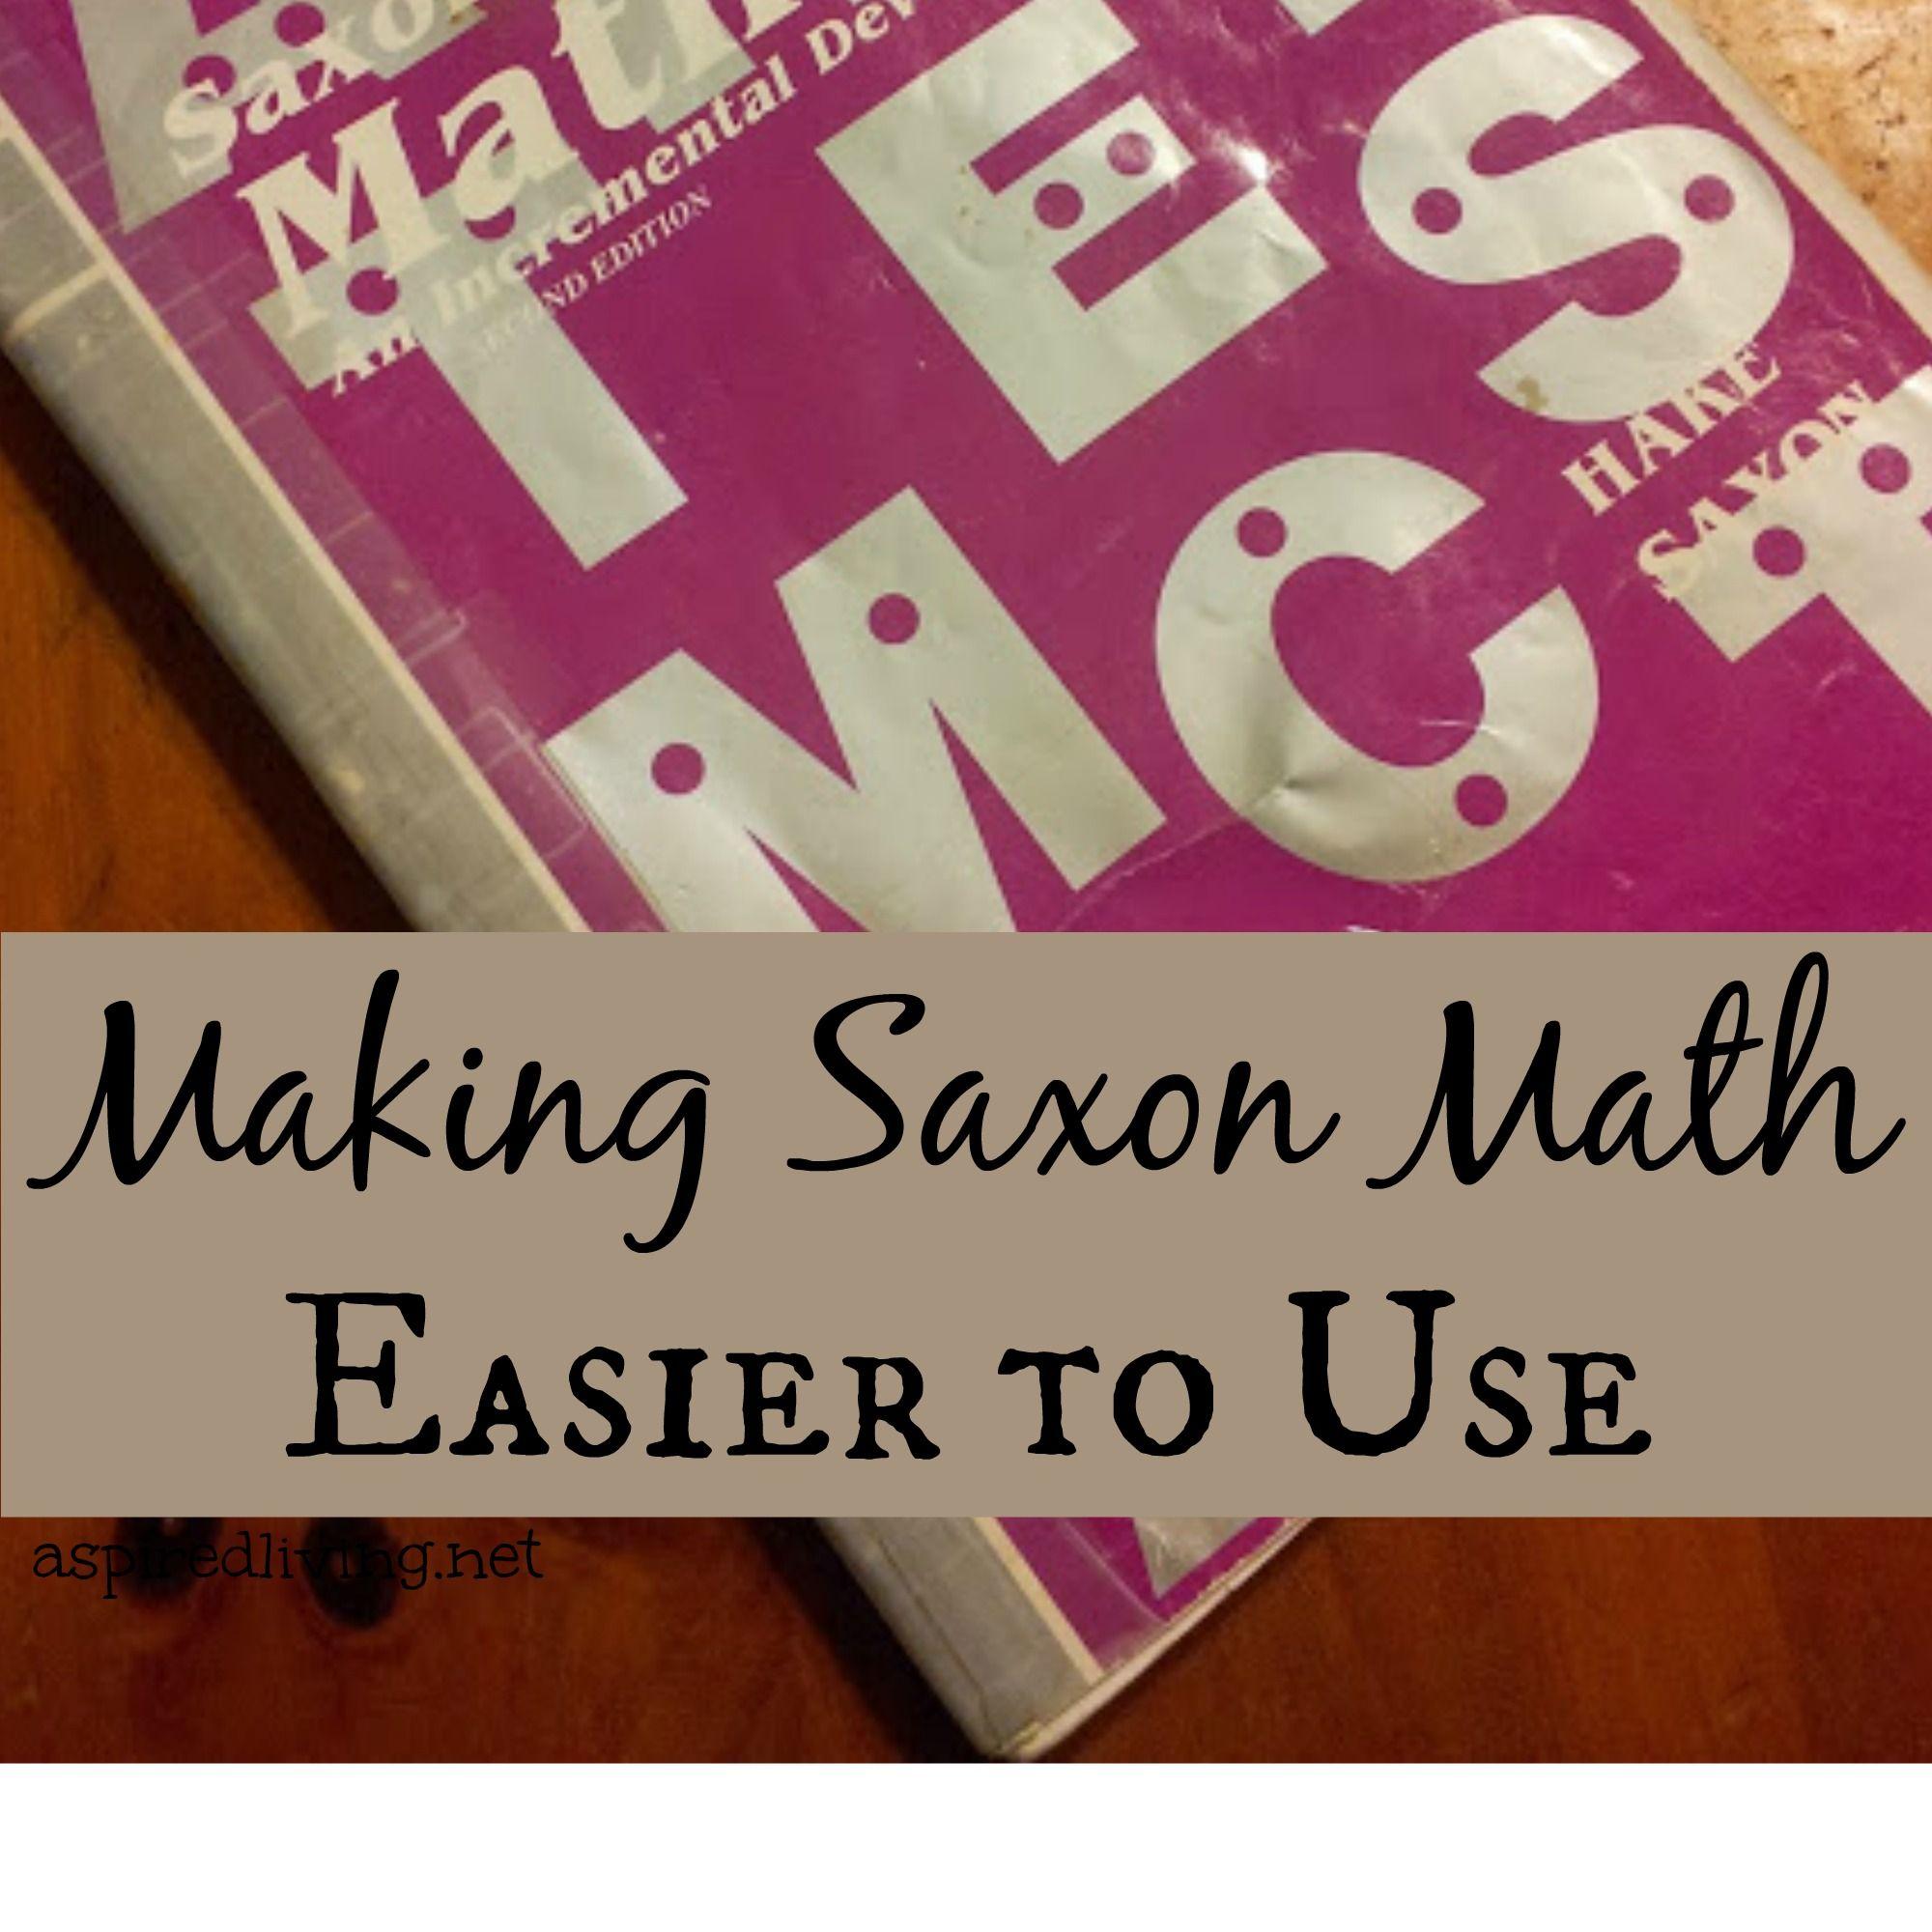 Making Saxon Easier To Use